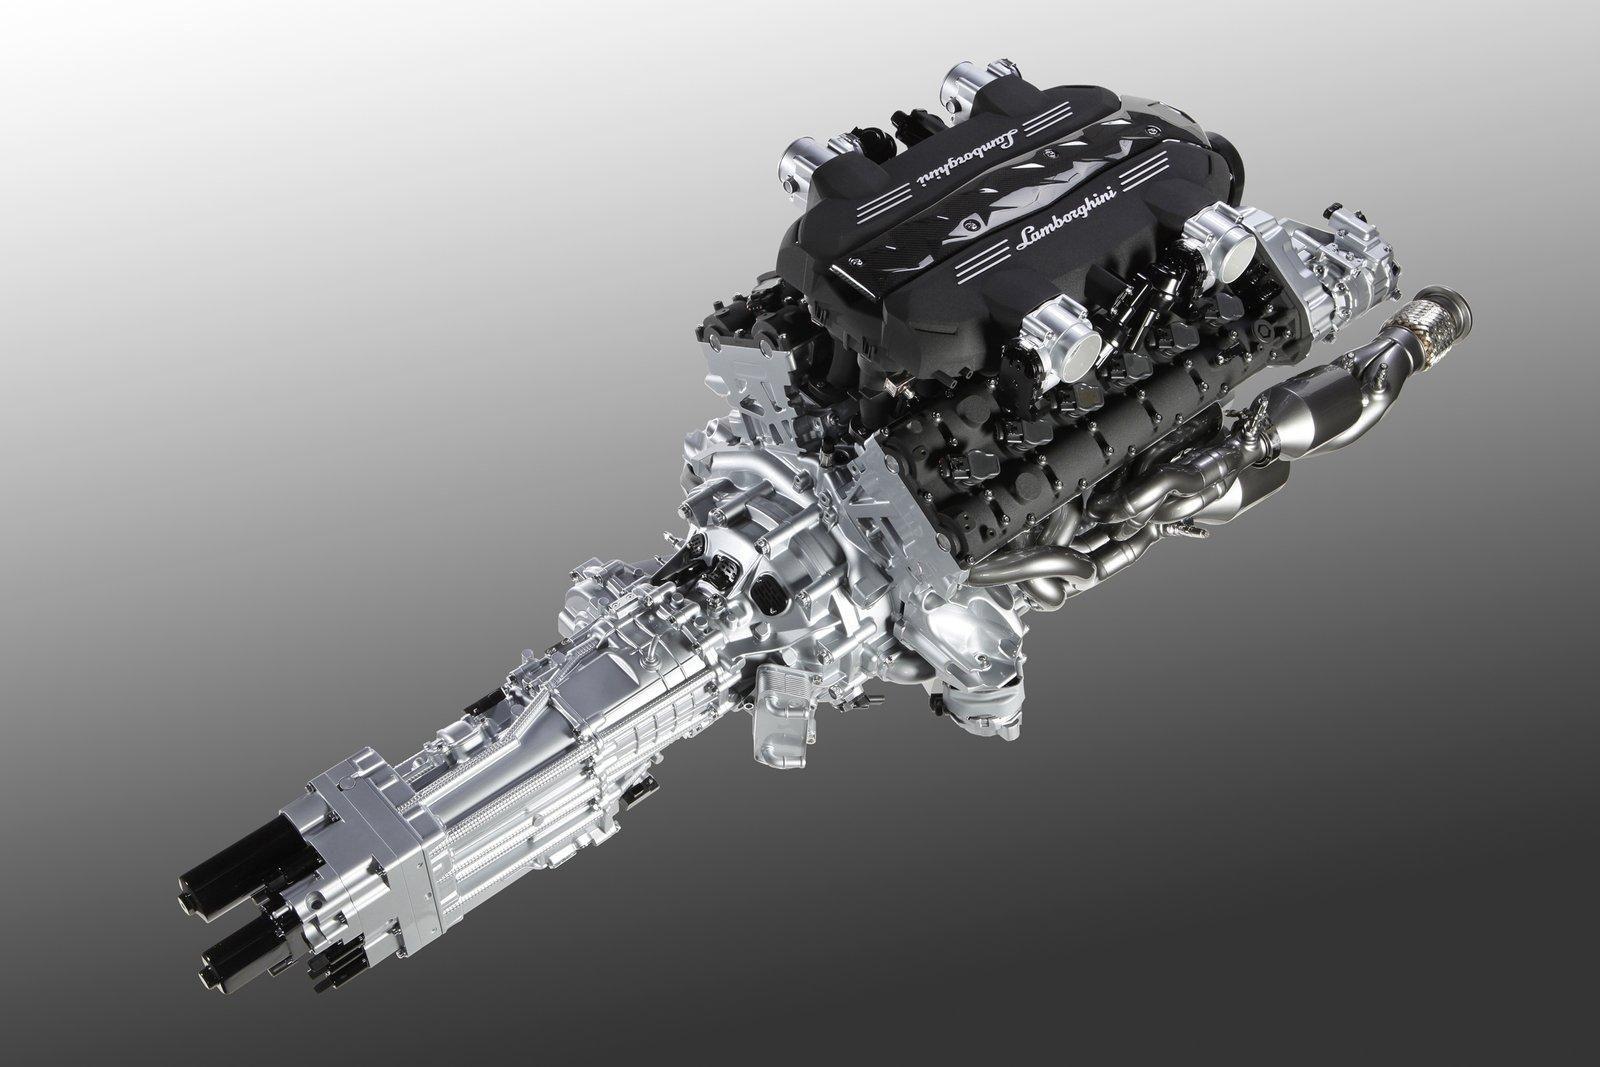 Lamborghini L539 Engine | Autos | Lamborghini, Lamborghini